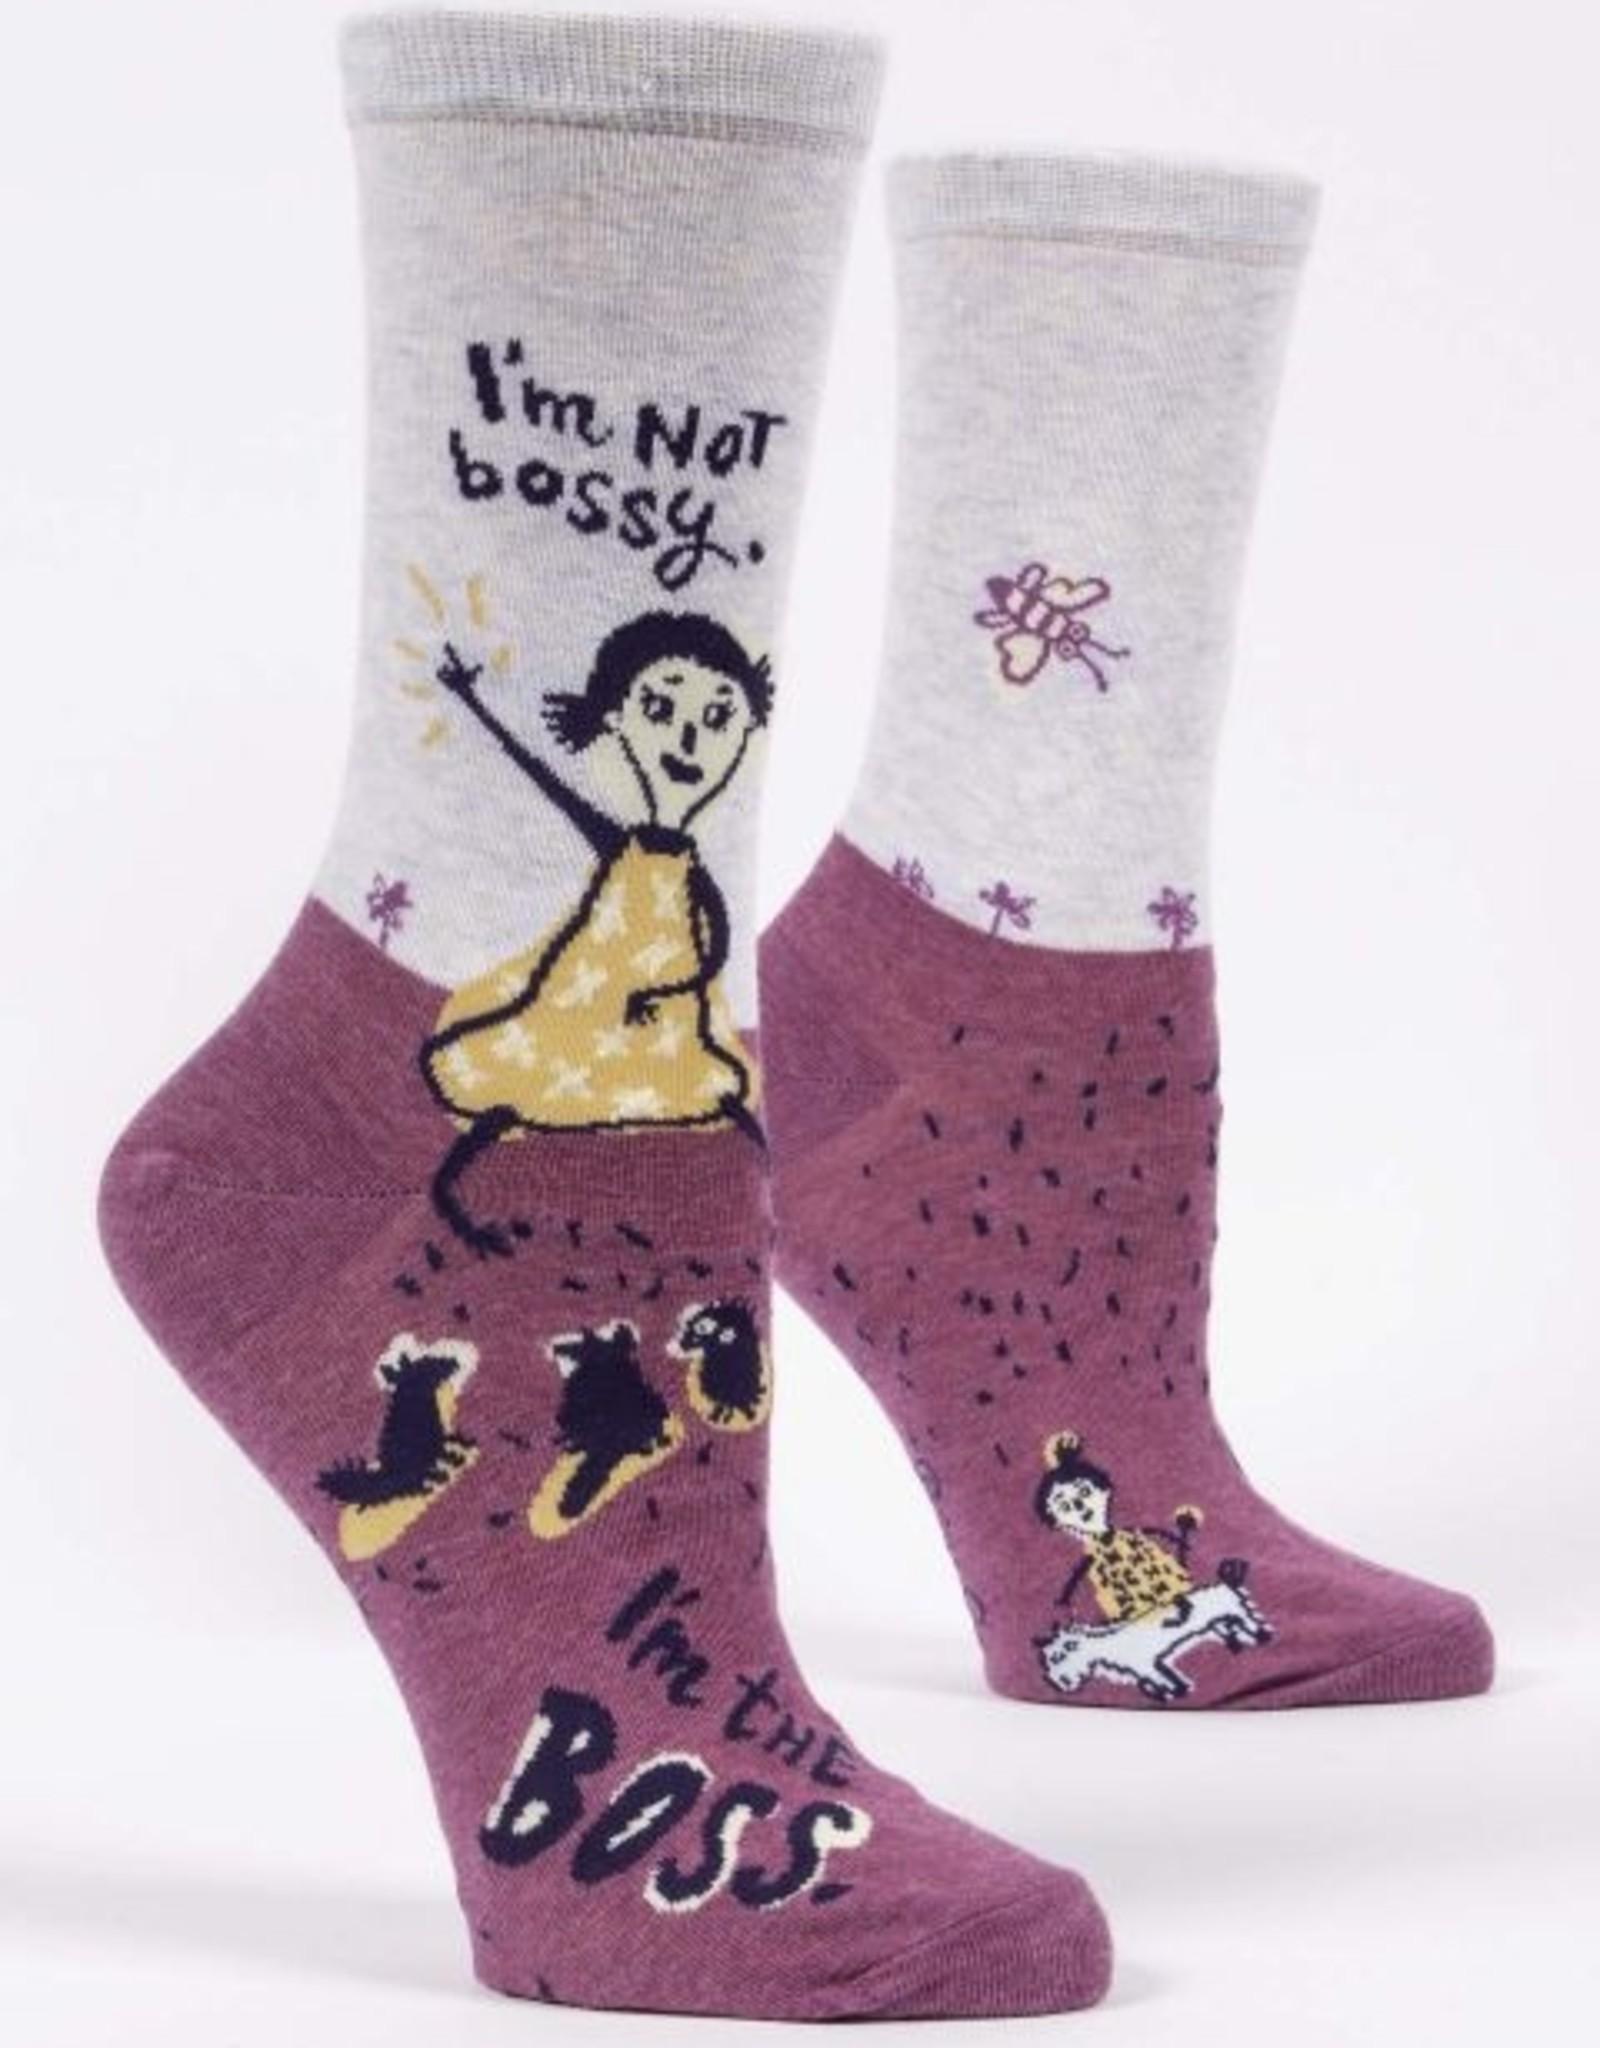 I'm Not Bossy Crew Socks